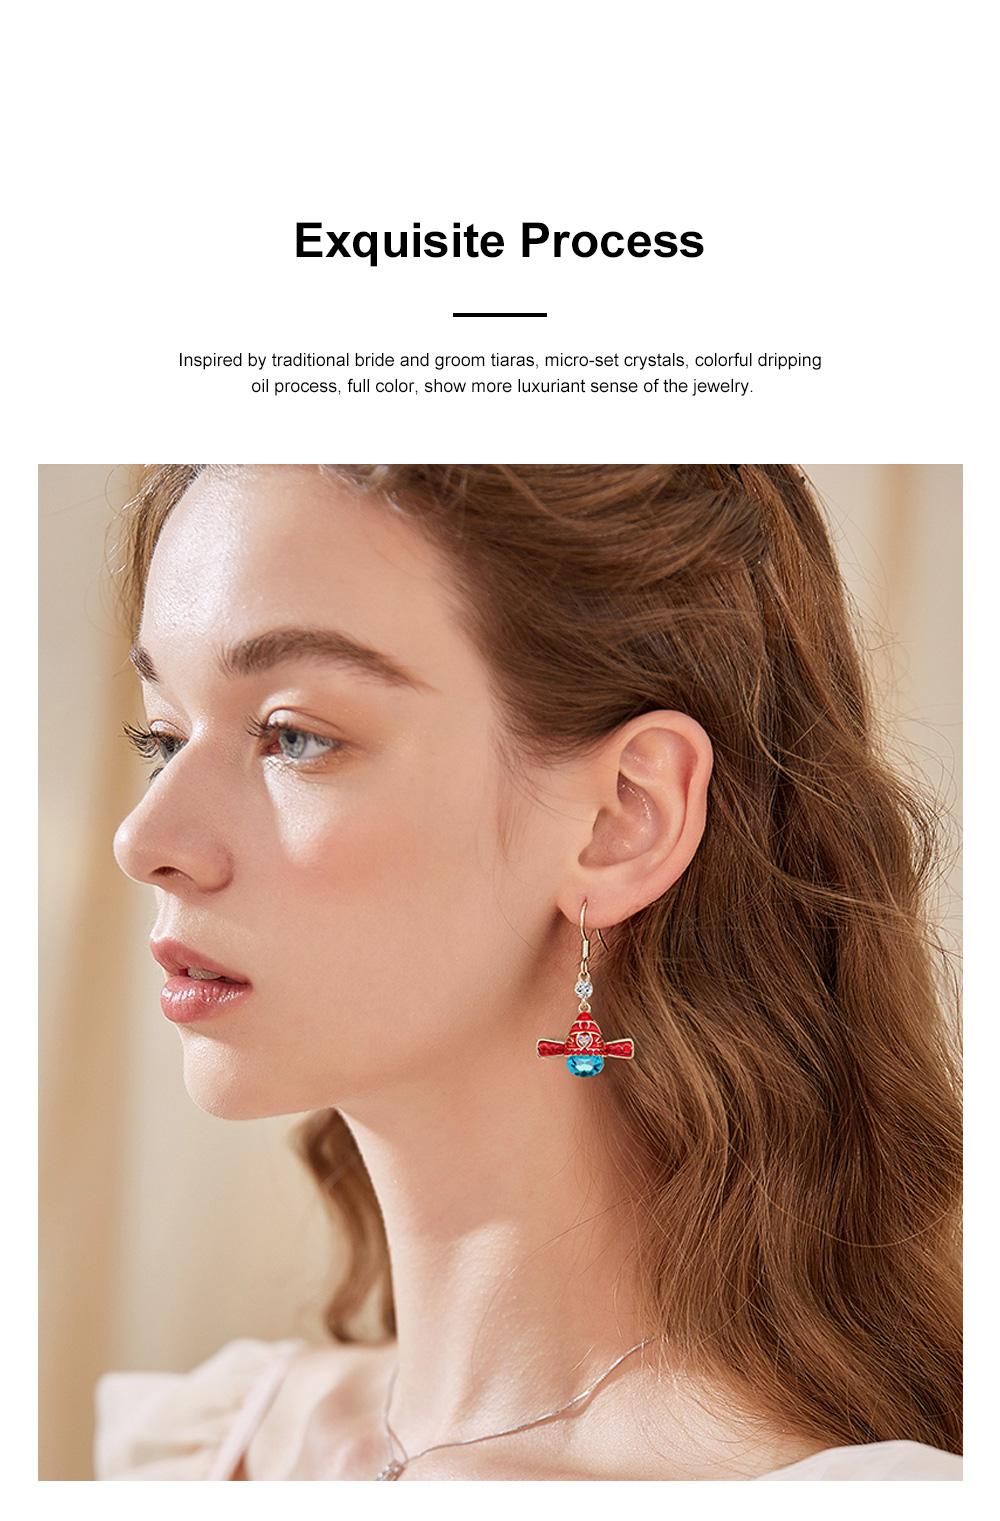 Chinese Style Dangle Earrings Asymmetric Personality Crystal Earrings Bride Groom Earrings Studs 3